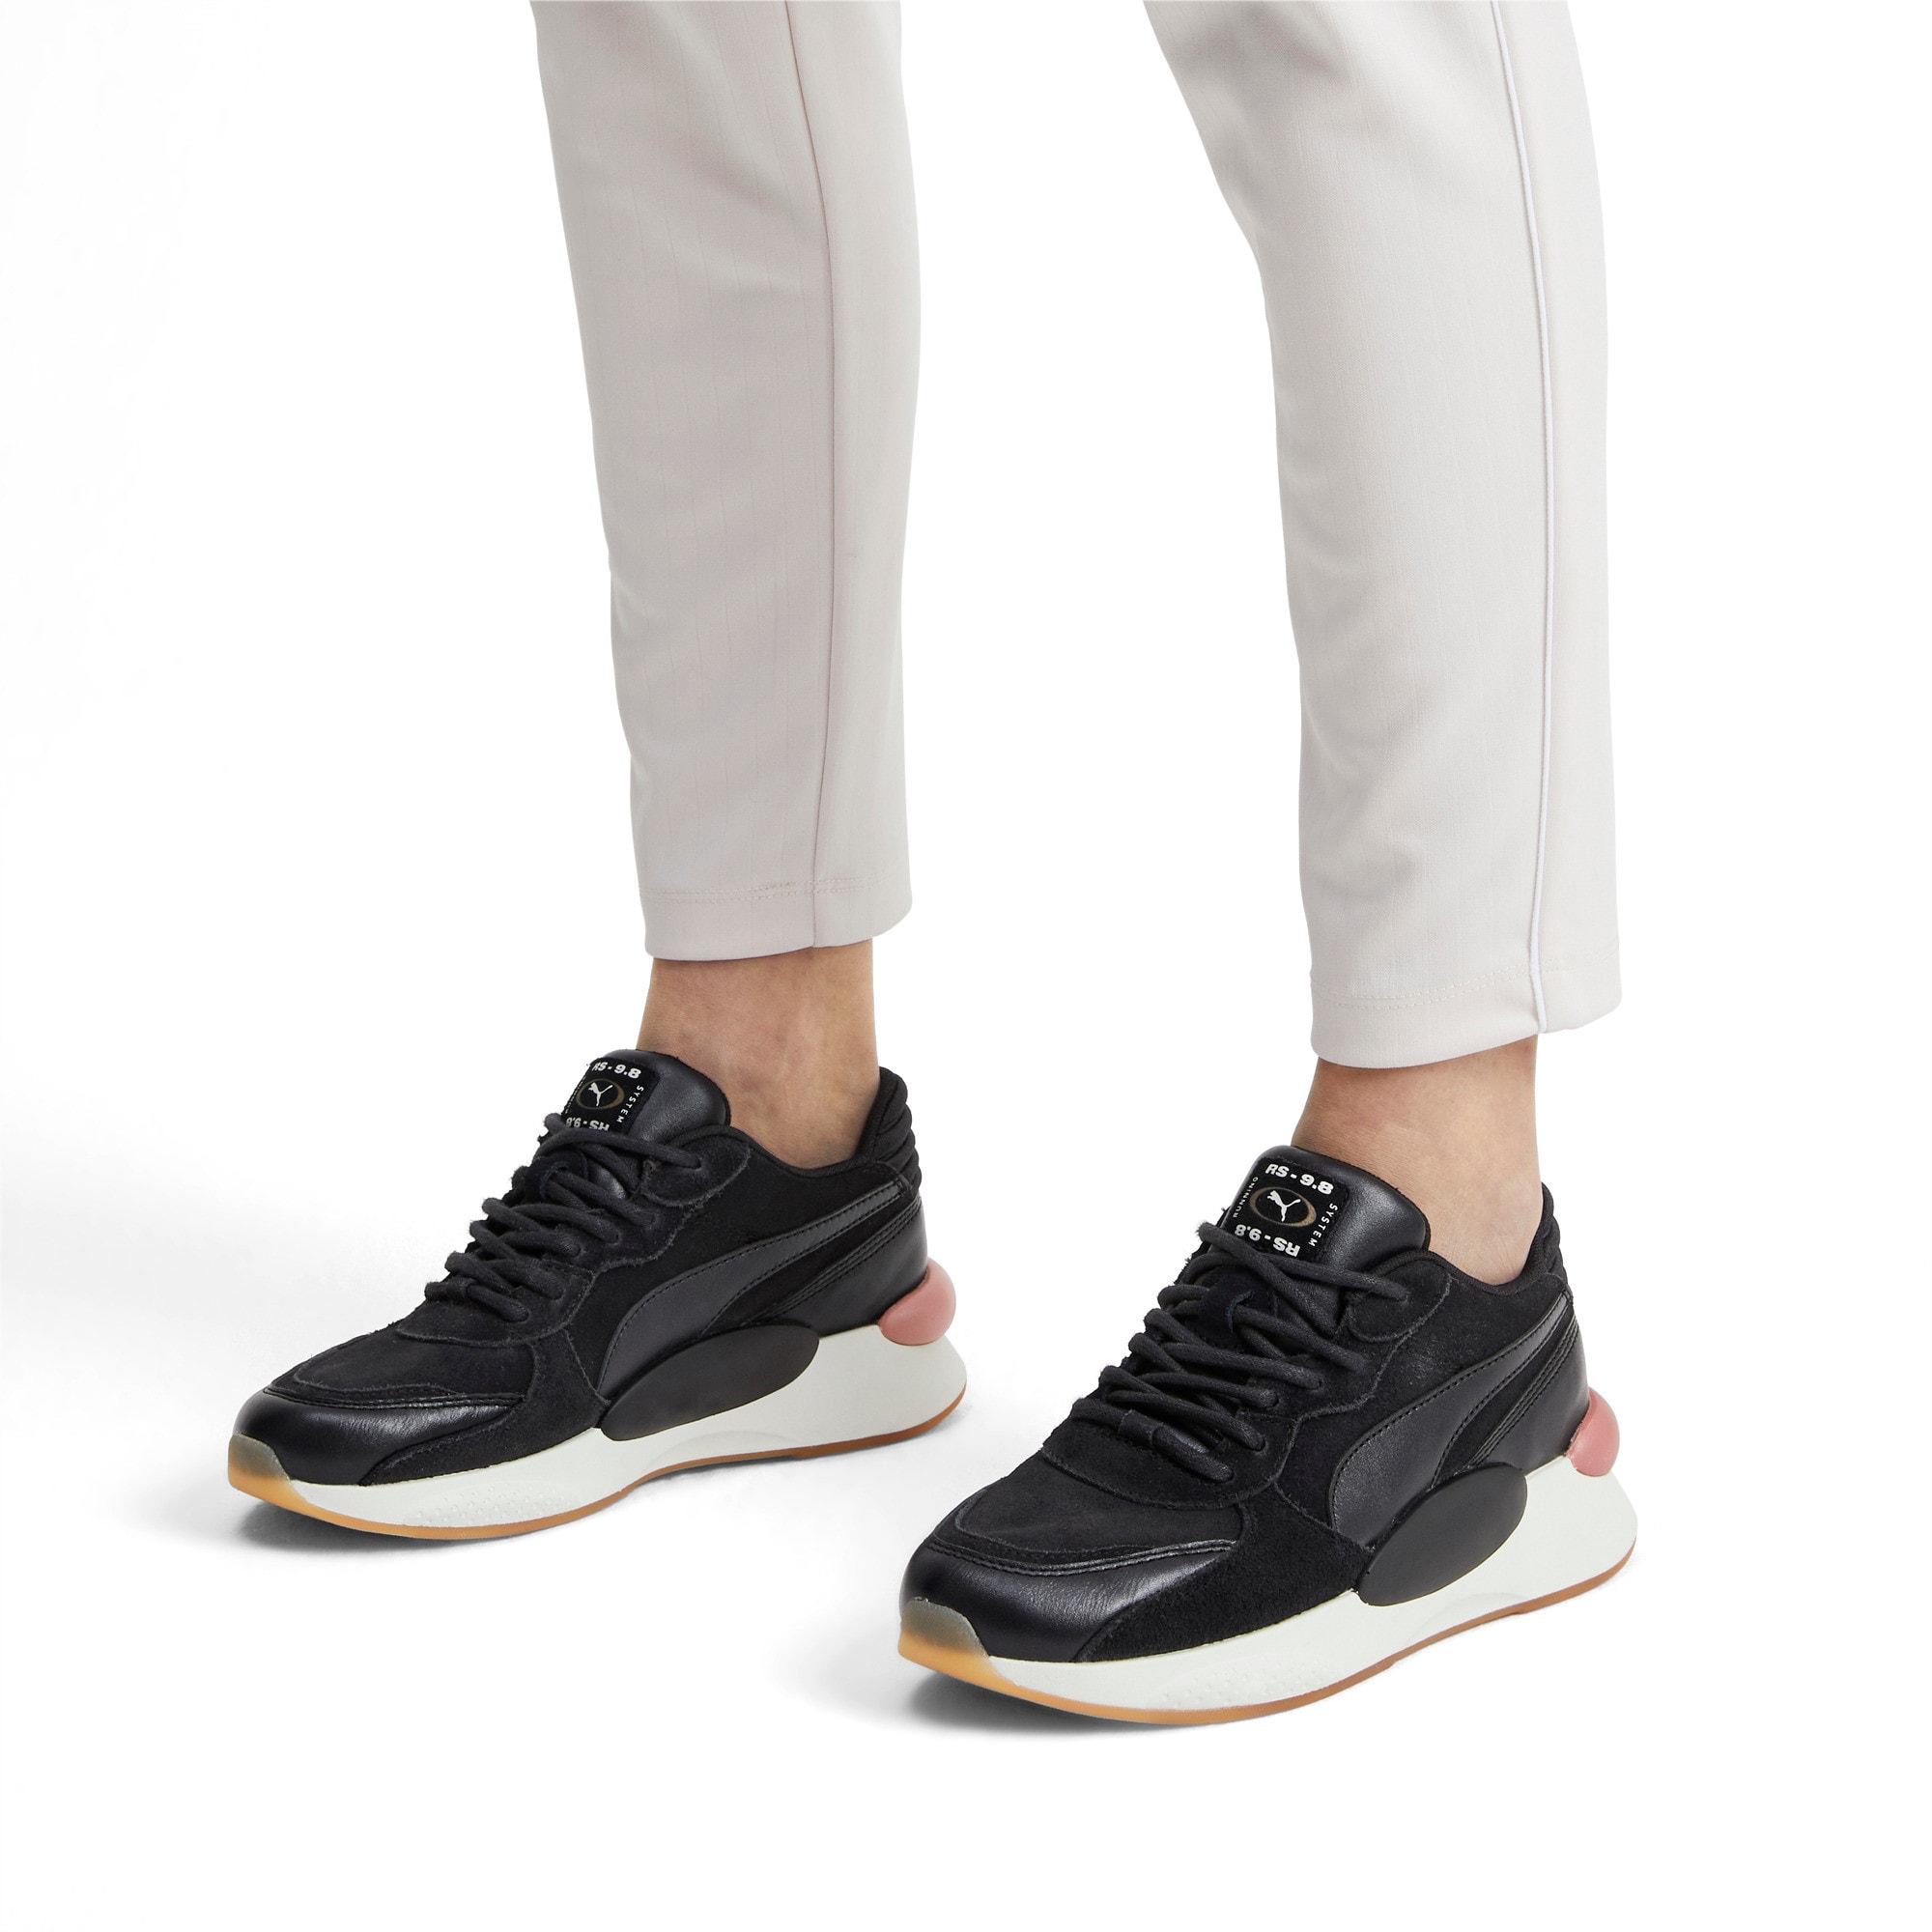 Thumbnail 2 of RS 9.8 Metallic Women's Sneakers, Puma Black Heather, medium